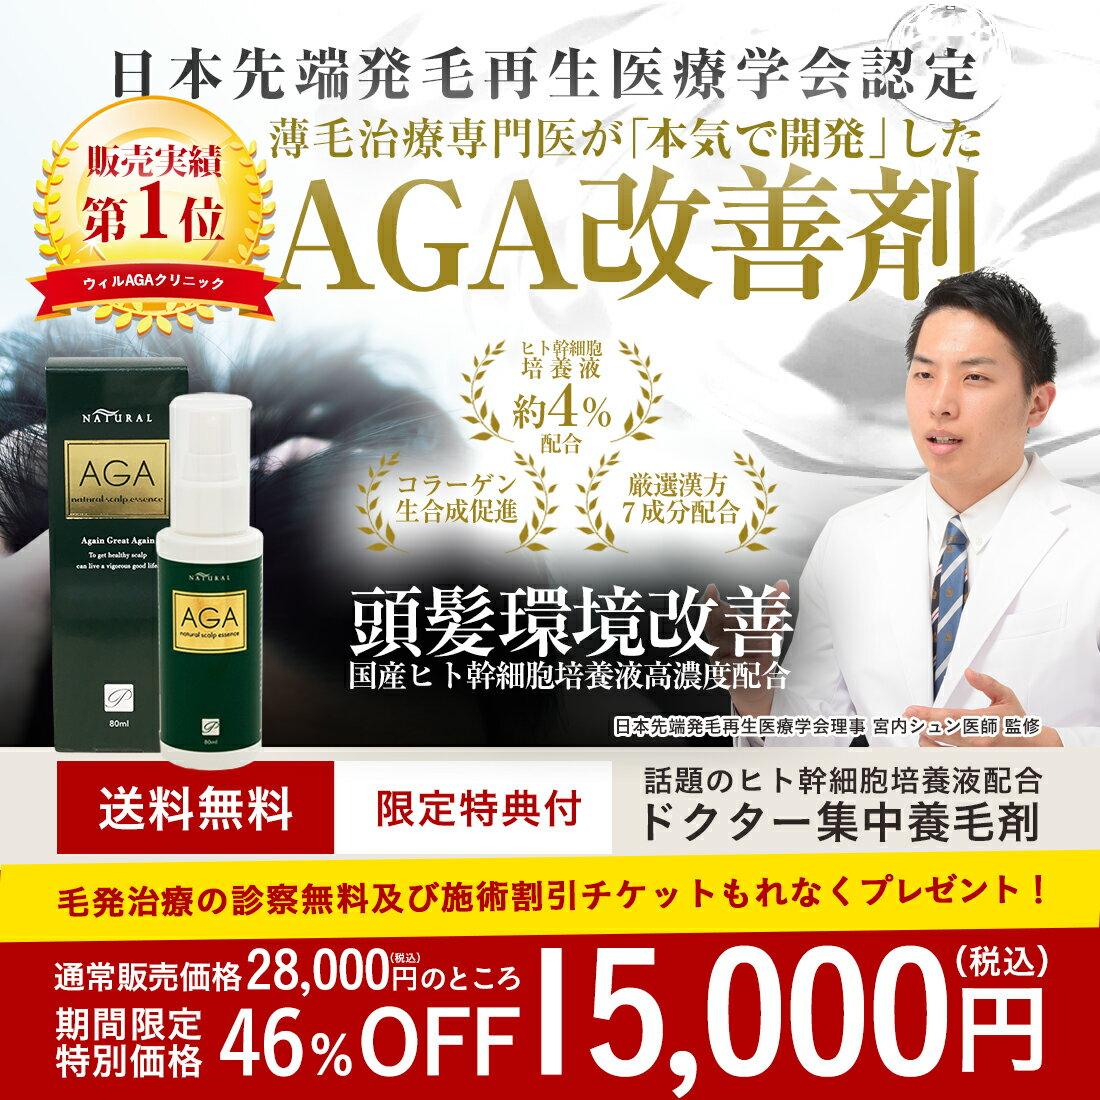 AGA監修 ドクター集中養毛剤 話題のヒト幹細胞培養液配合 AGAスカルプエッセンス 【60ml】